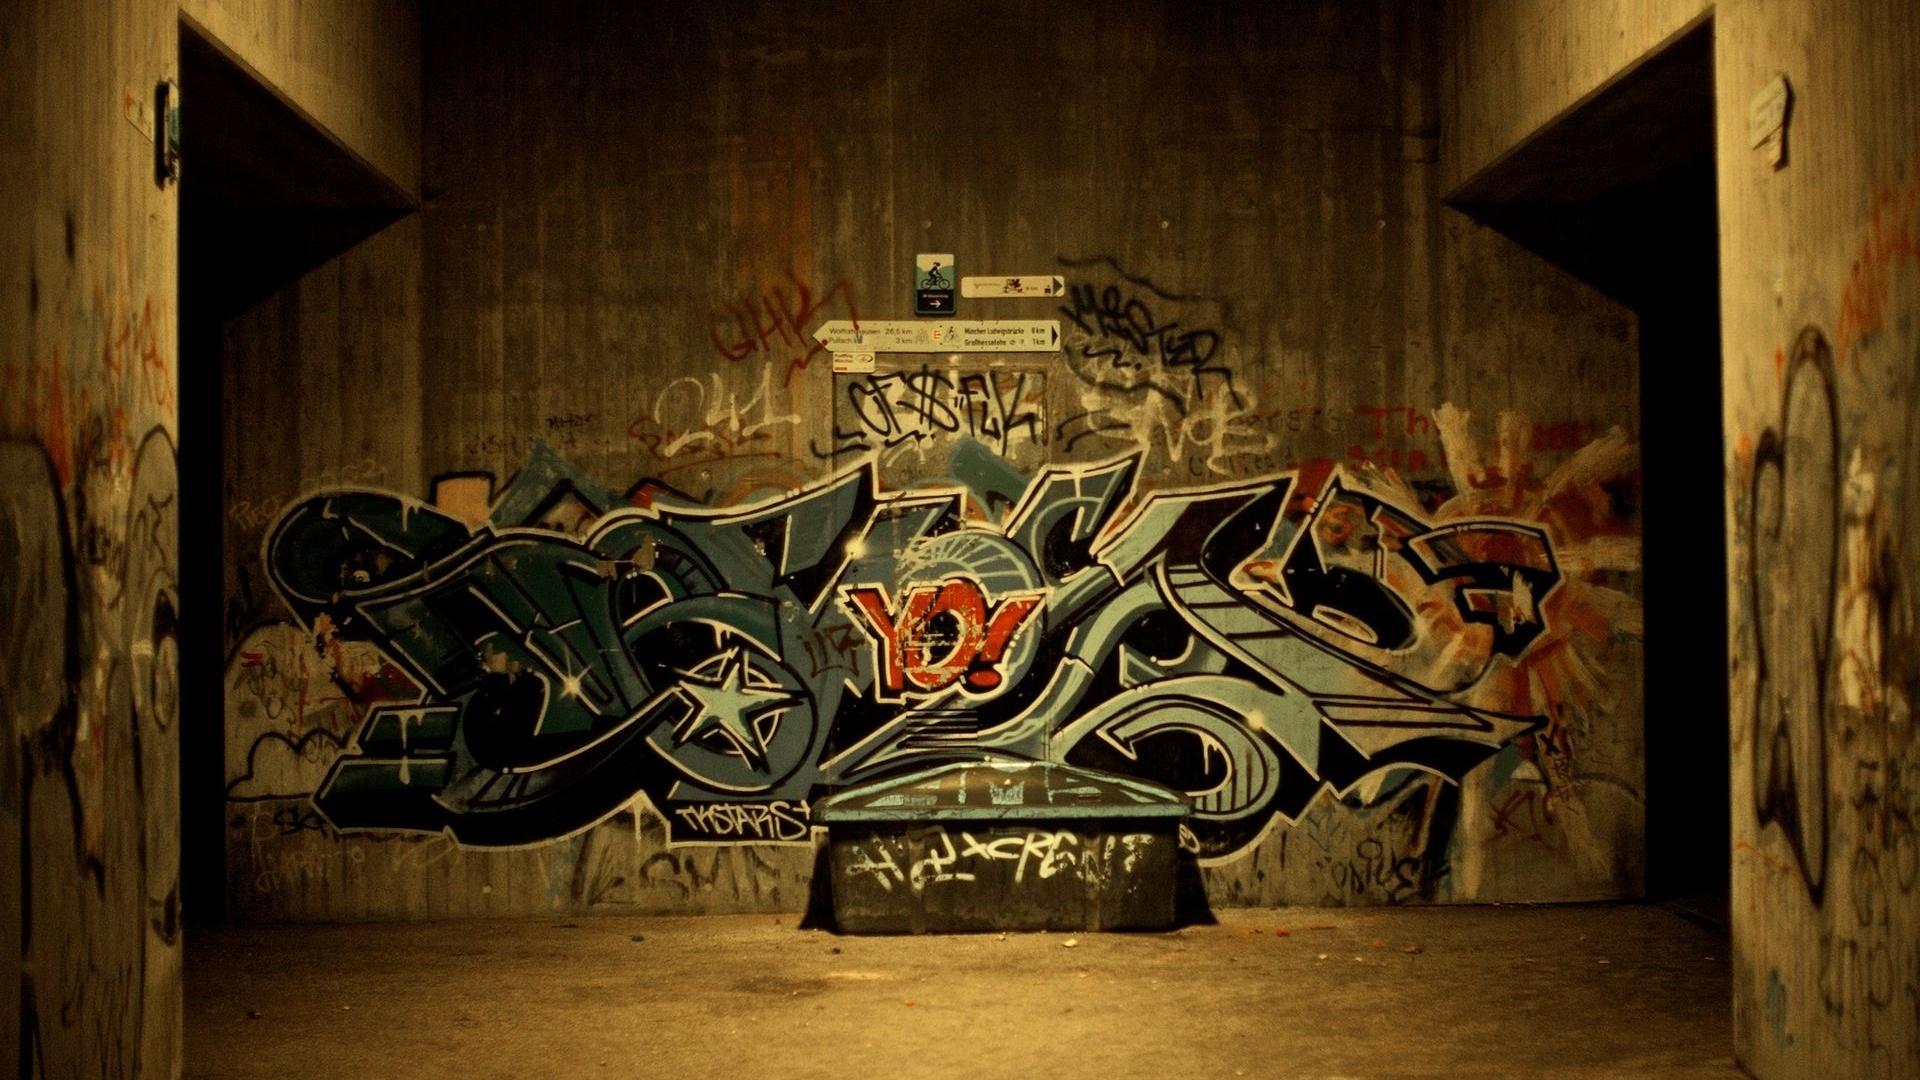 1920x1080-rap-hip-hop-graffiti-street-art-graffiti-hip-hop-street-art-download-with-n-wallpaper-wp340909